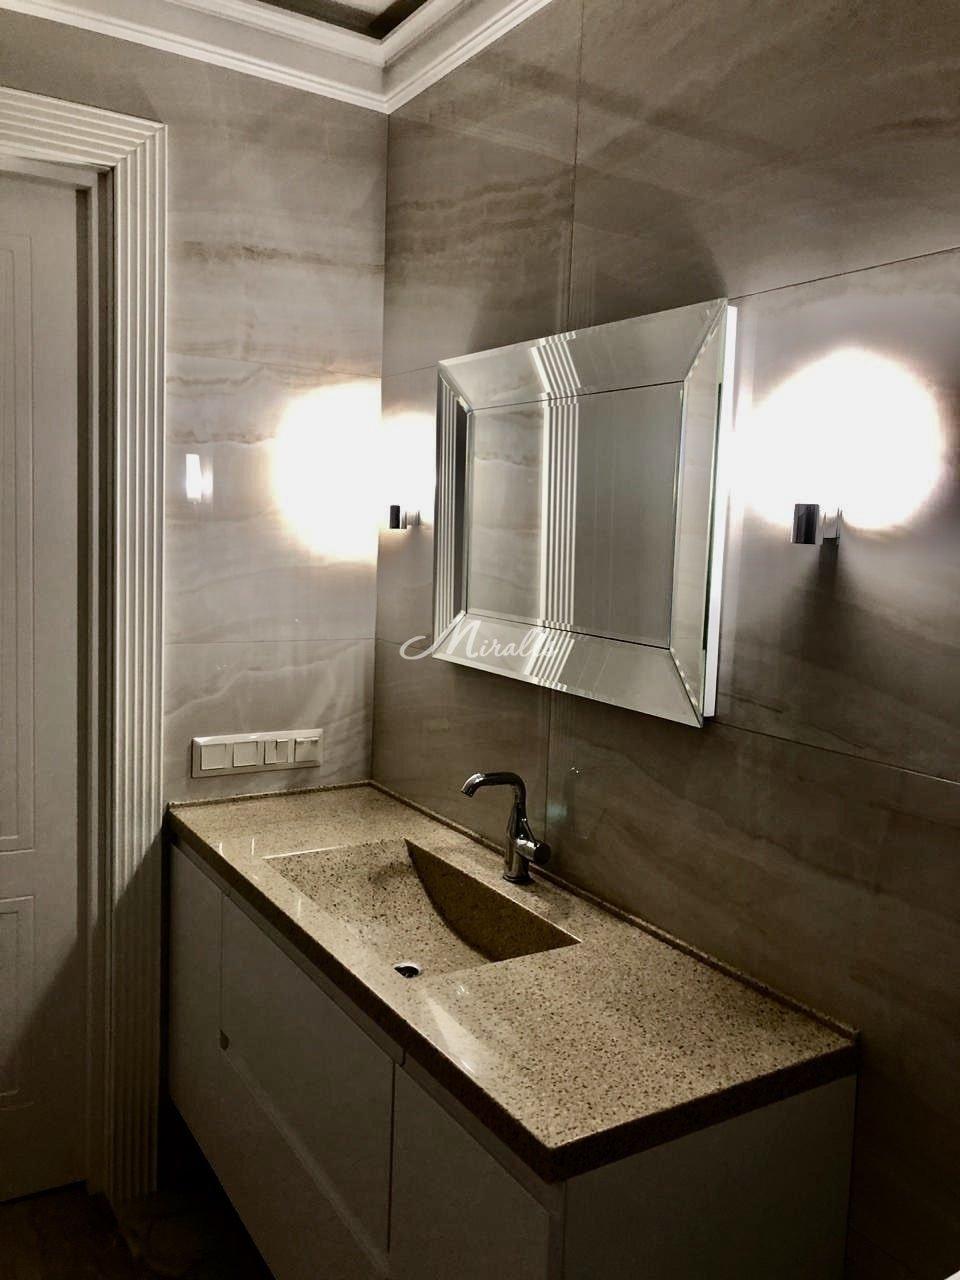 Зеркало Provance в частном санузле (ЖК NewPiter)